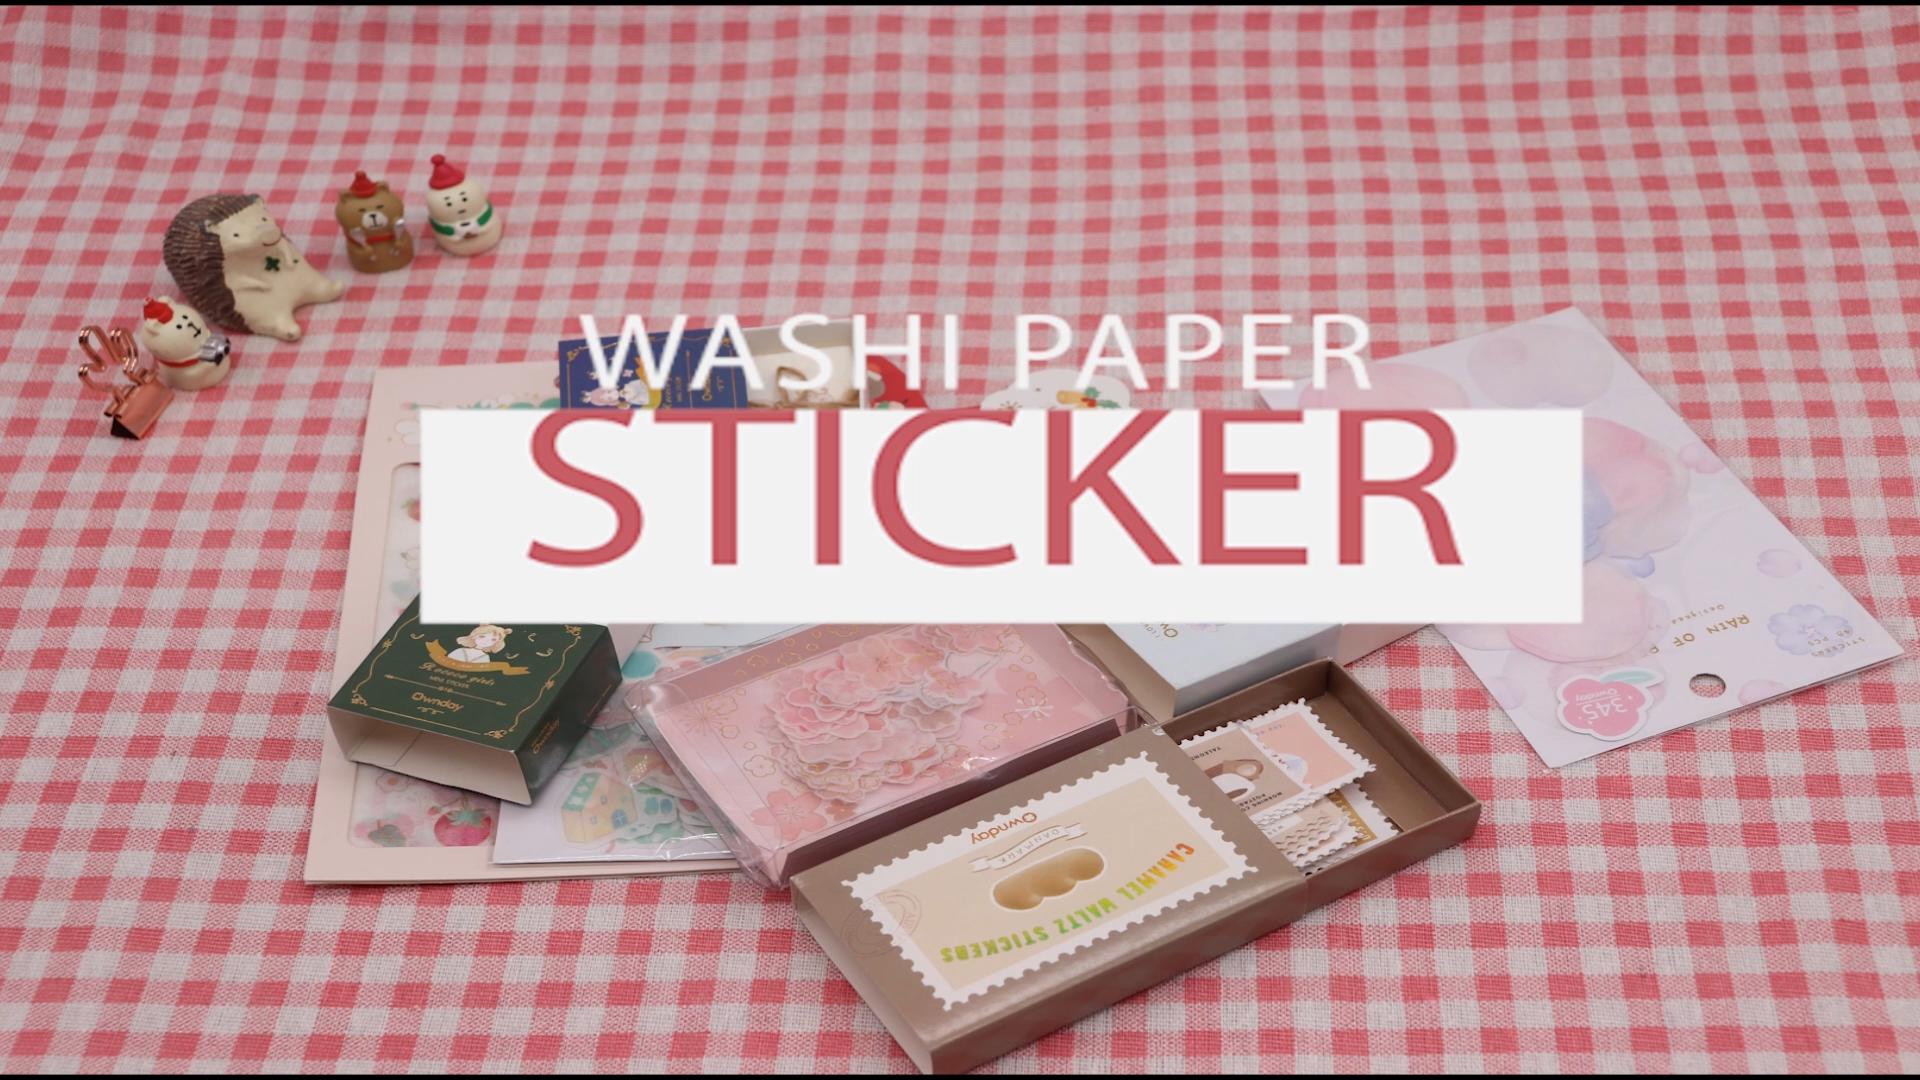 Ownday 101433 A petish conjunto personalizado bonito de kawaii crianças estudante fantasia planejador de papel washi adesivo